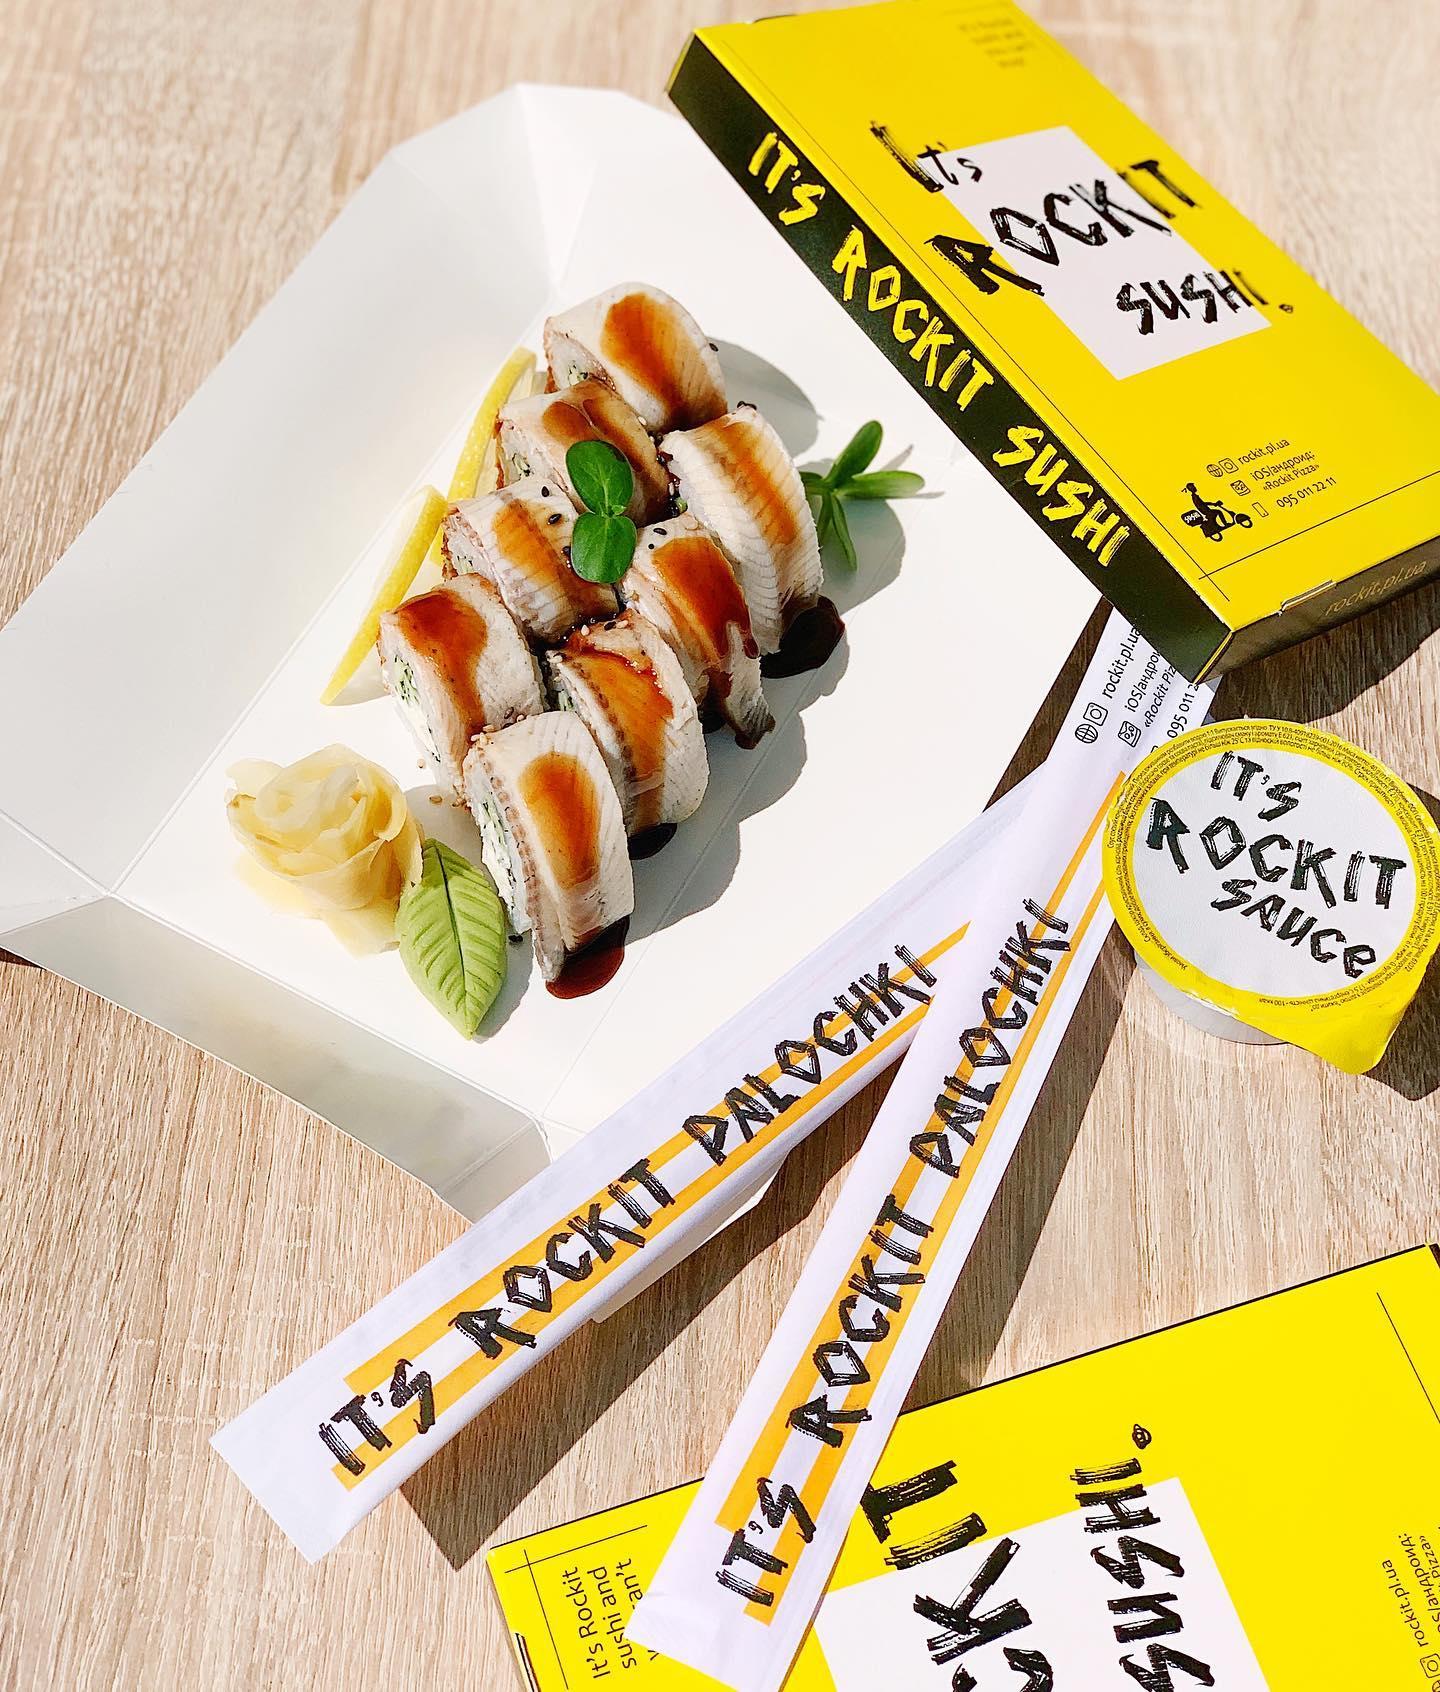 Rockit pizza & sushi